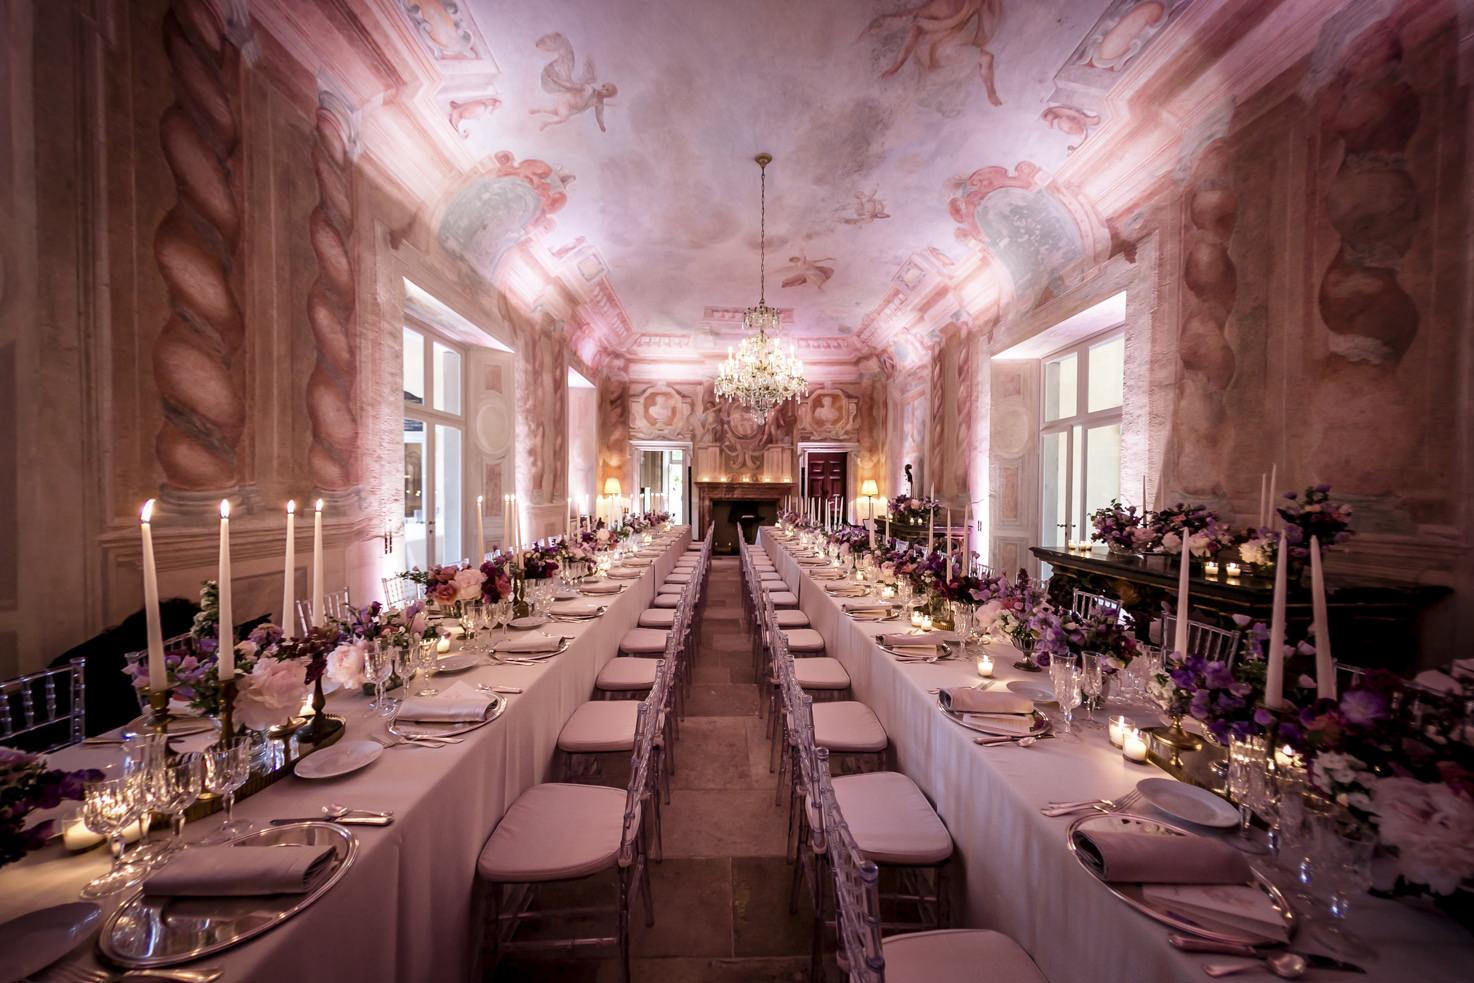 Wedding banquet at Villa il Balbiano